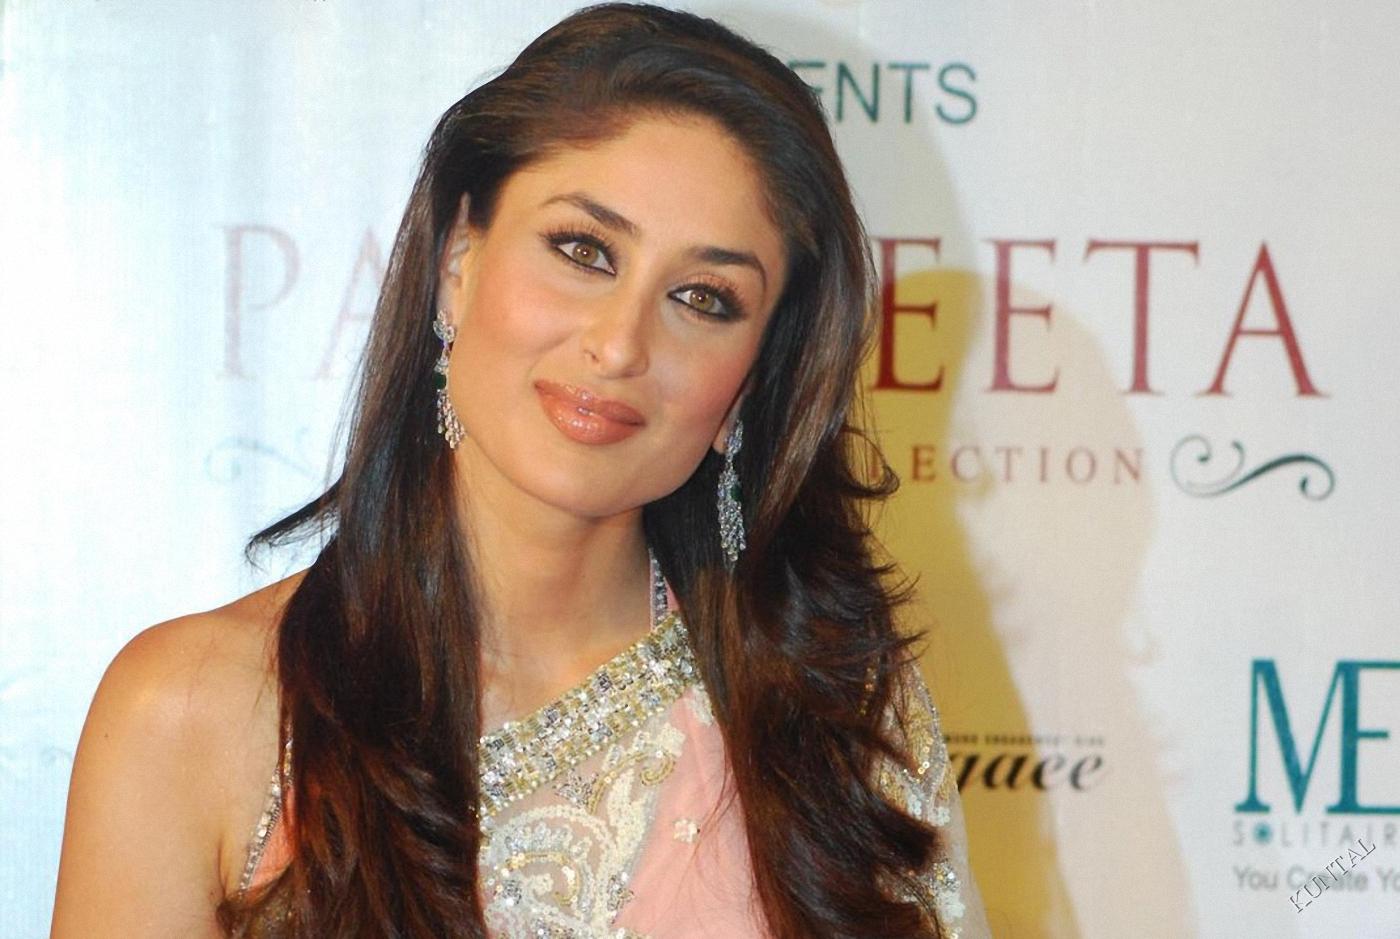 521 Entertainment World: Latest Kareena Kapoor Hot Sexy Wallpapers 2012